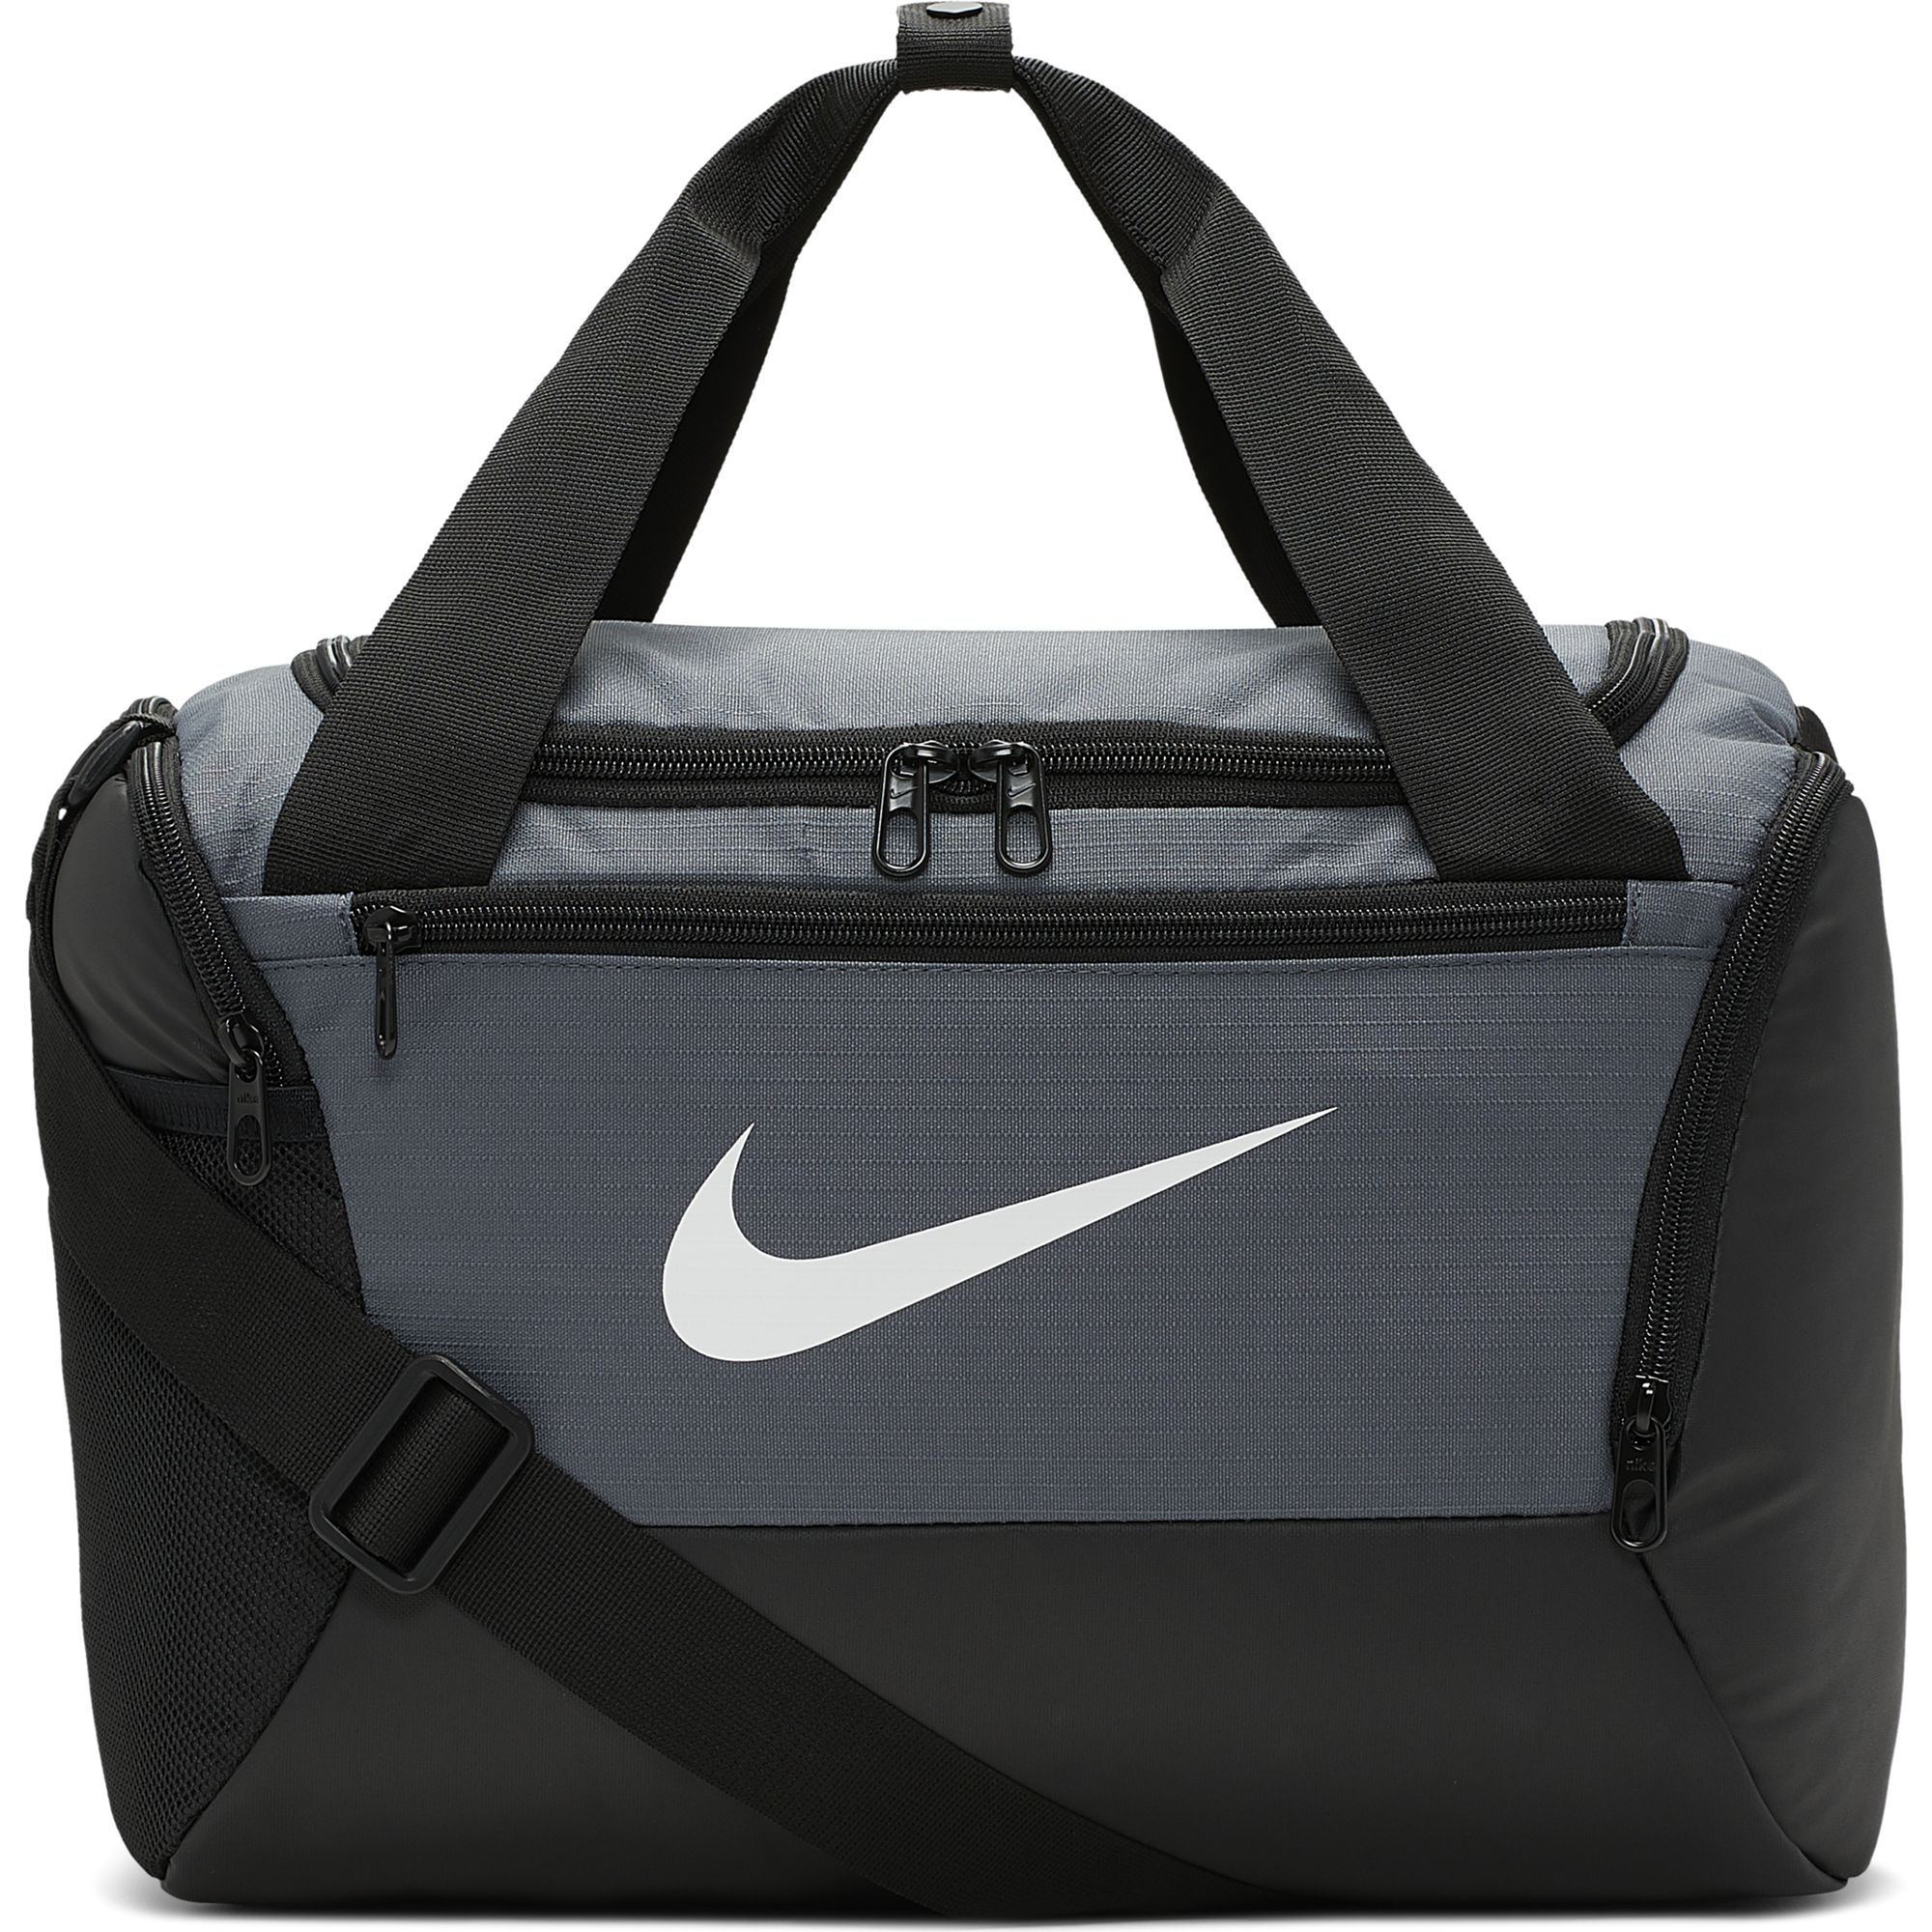 Brasilia X-Small Duffel Bag, Gray/Black, swatch